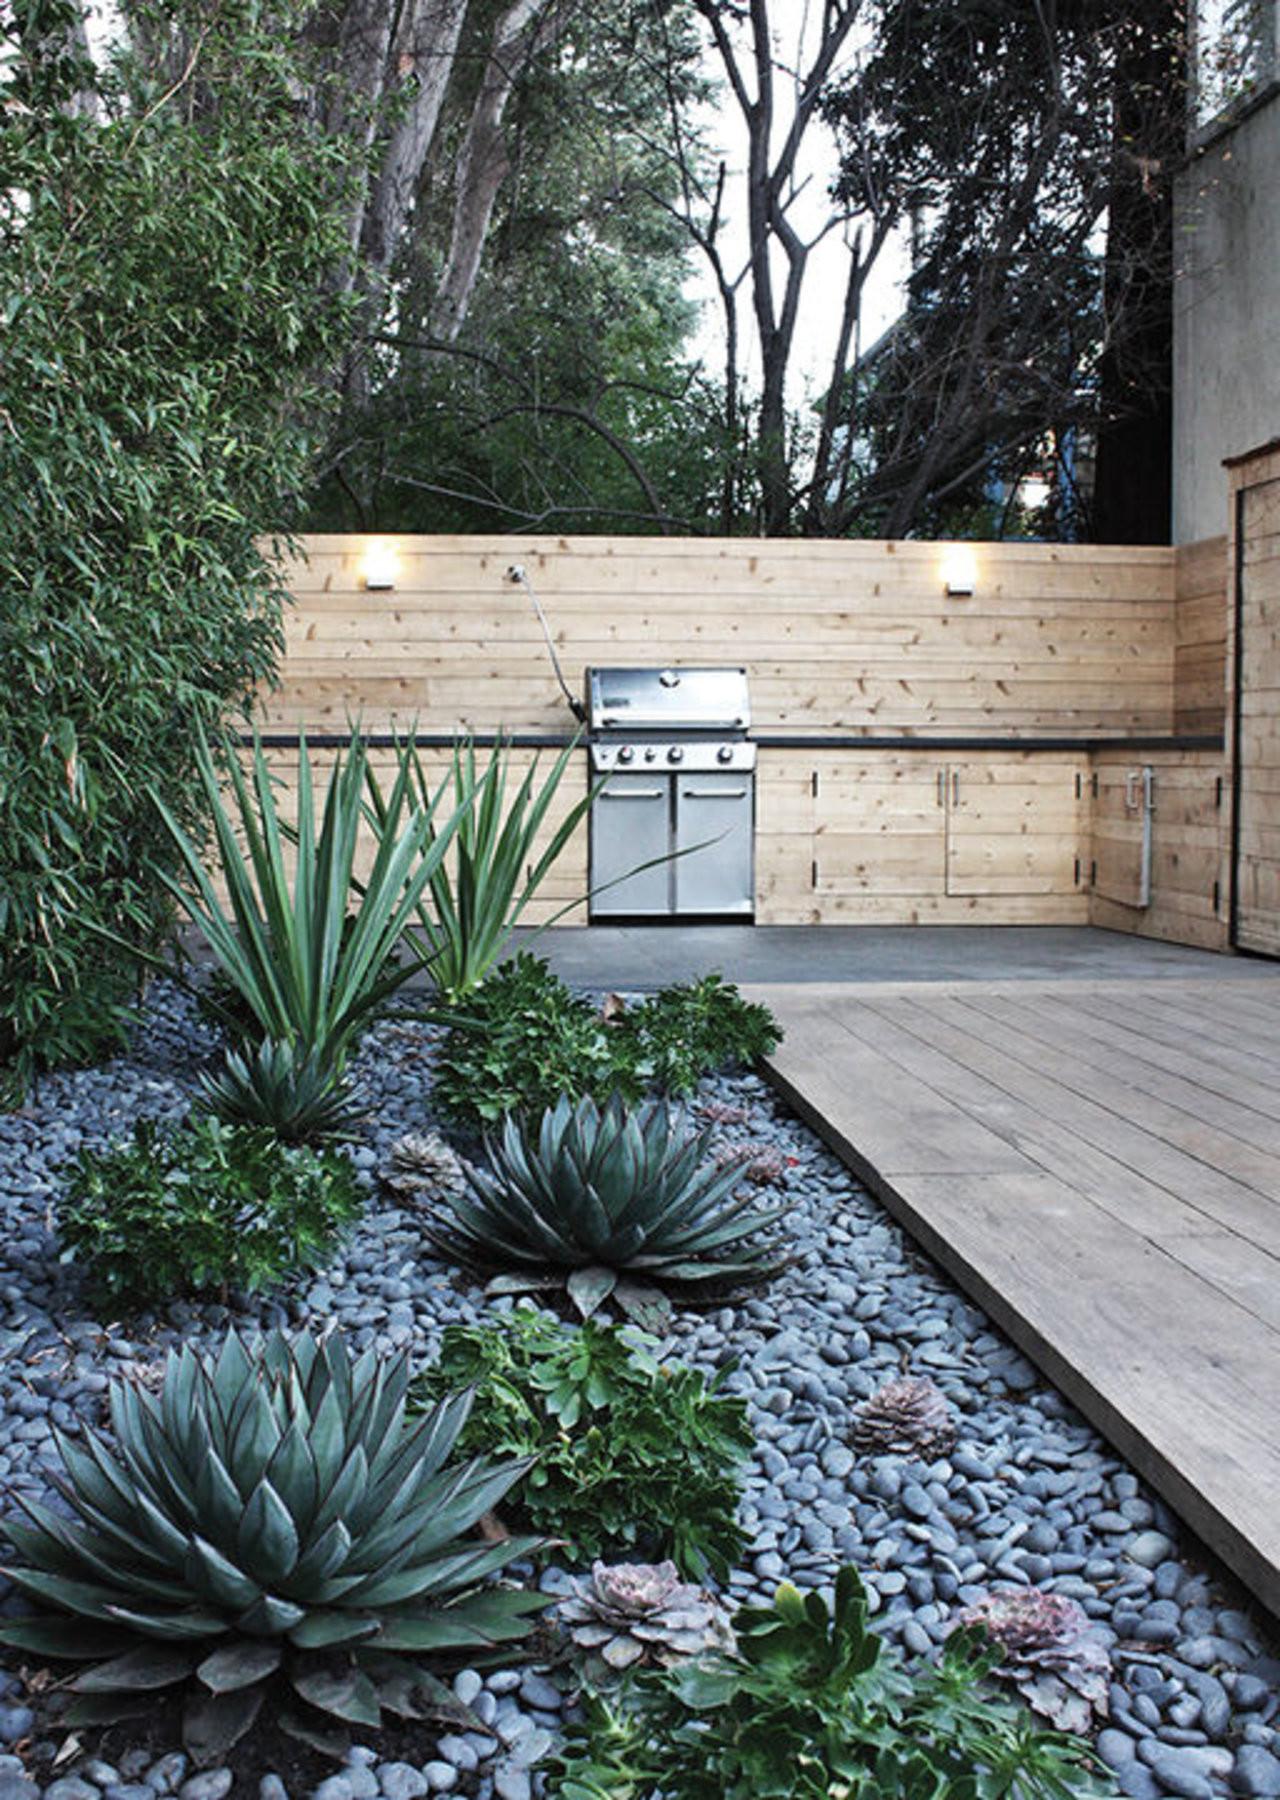 Best ideas about Garden Landscape Ideas . Save or Pin 50 Best Succulent Garden Ideas for 2019 Now.